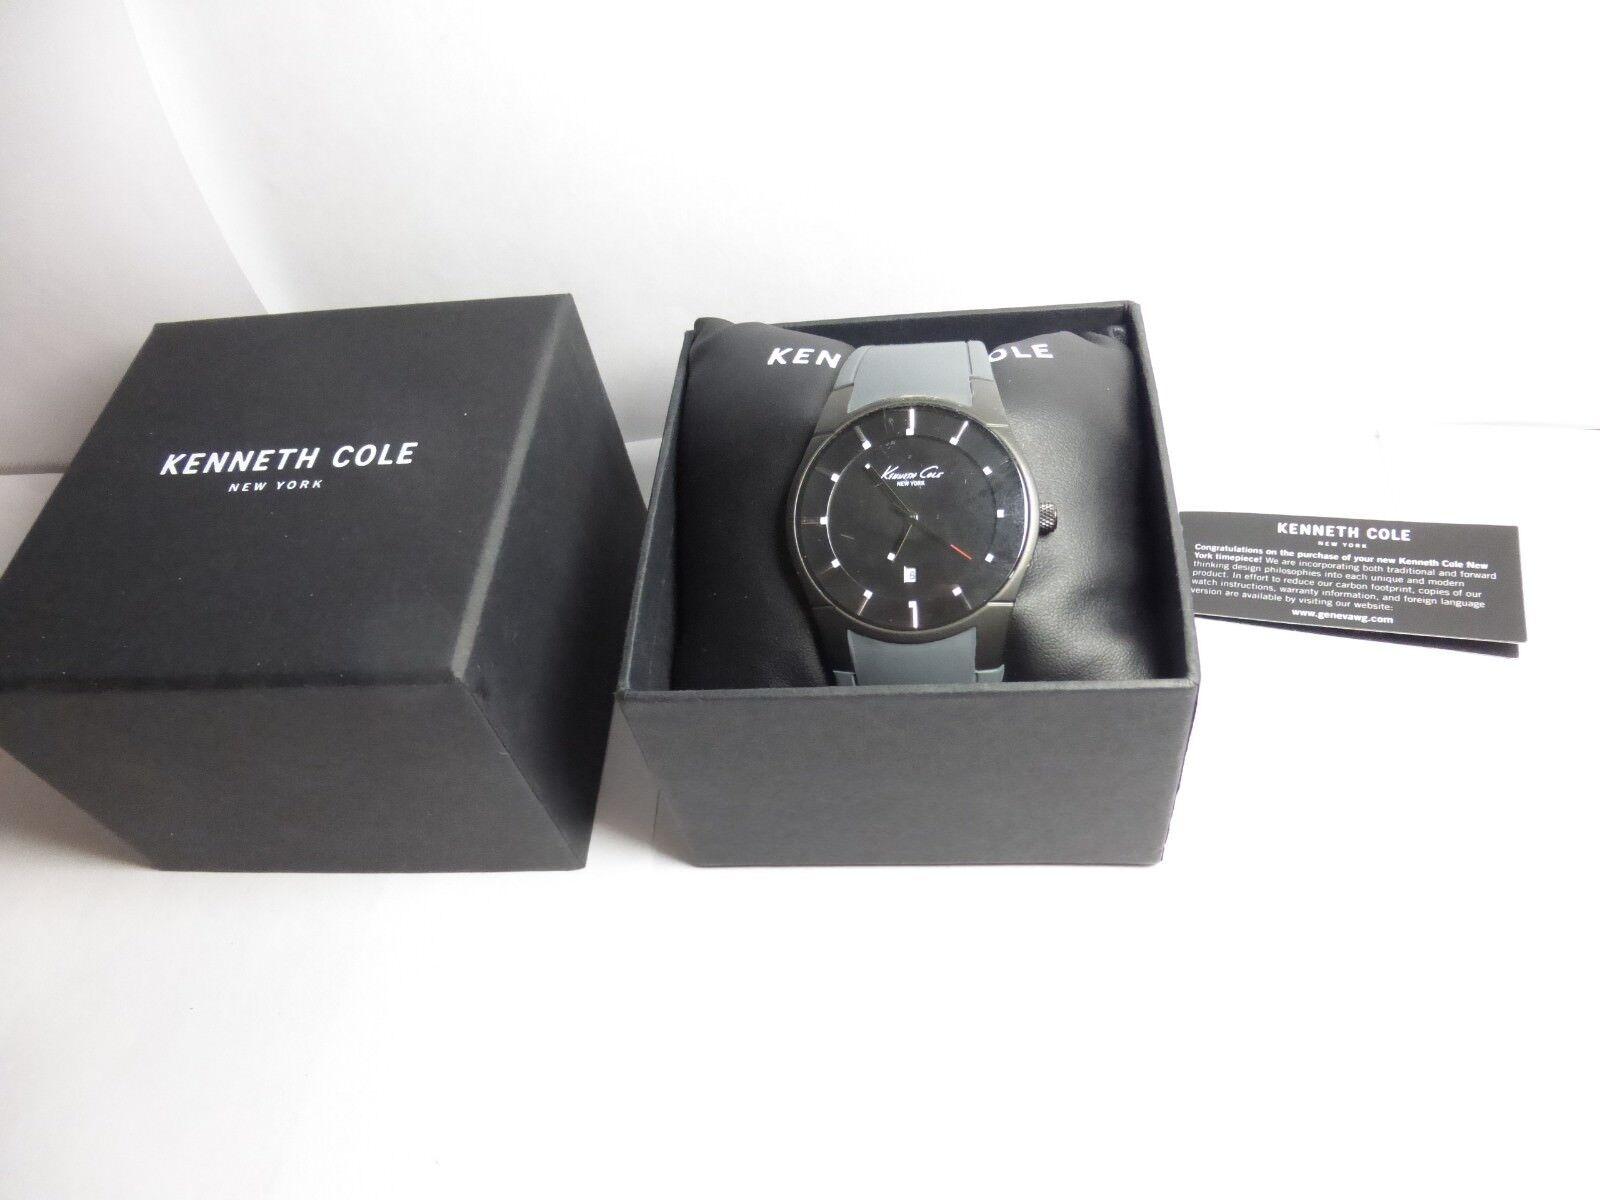 cc63146cecc Kenneth Cole Men s Slim Analog Quartz Grey Wrist Watch KC10027723 ...